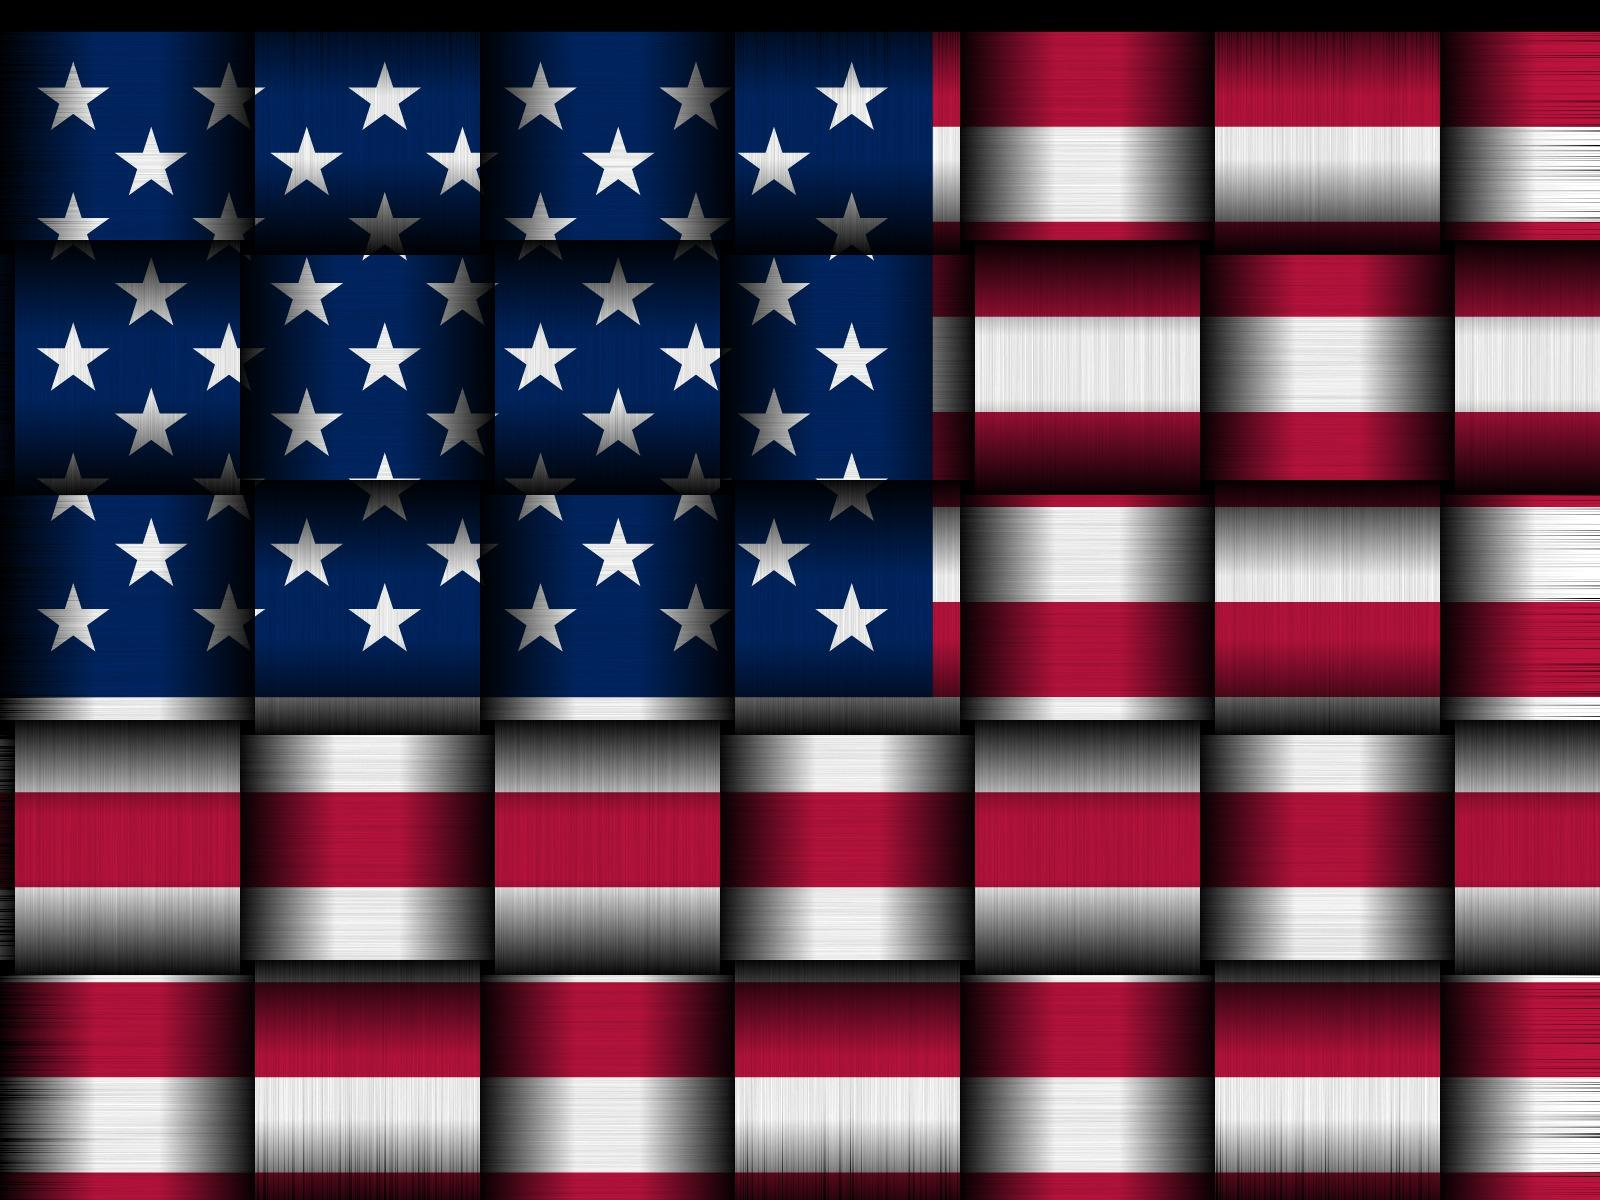 american flag desktop wallpapers wallpaper cave